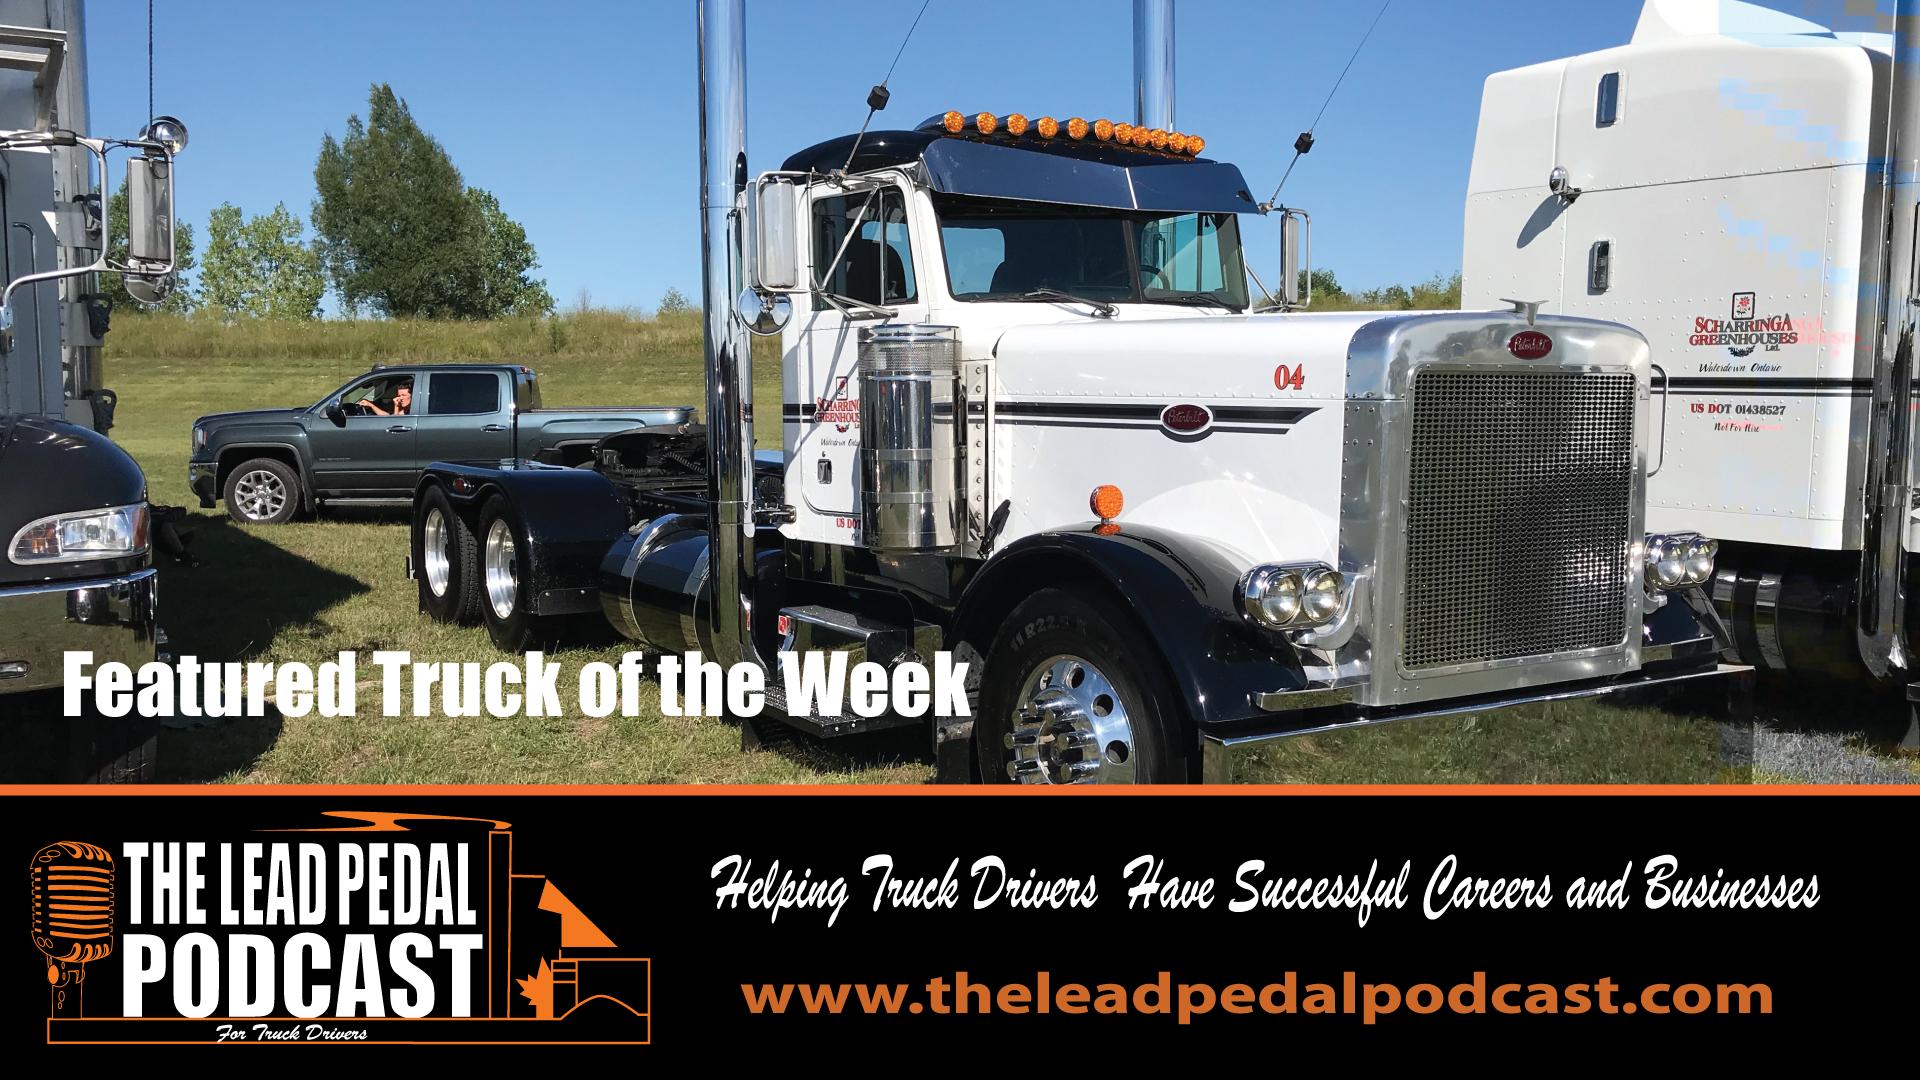 Featured Truck-White Peterbilt